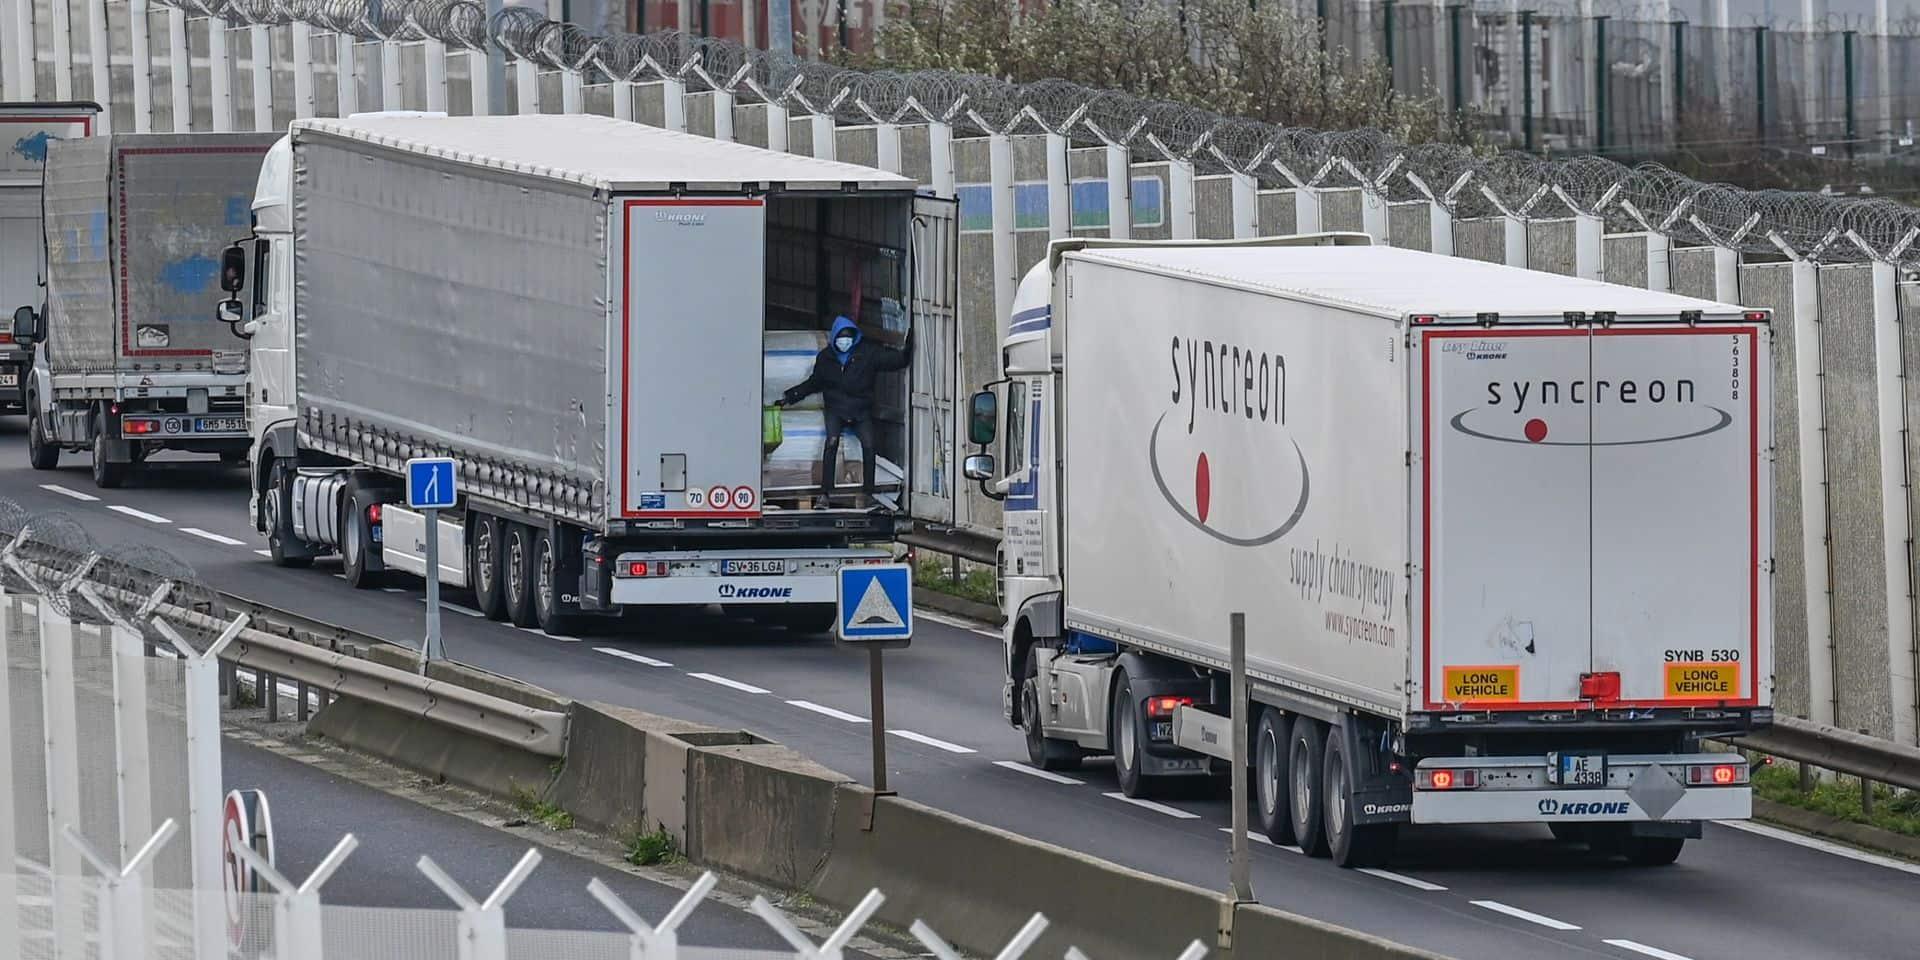 Accord Royaume-Uni/France pour freiner l'immigration clandestine